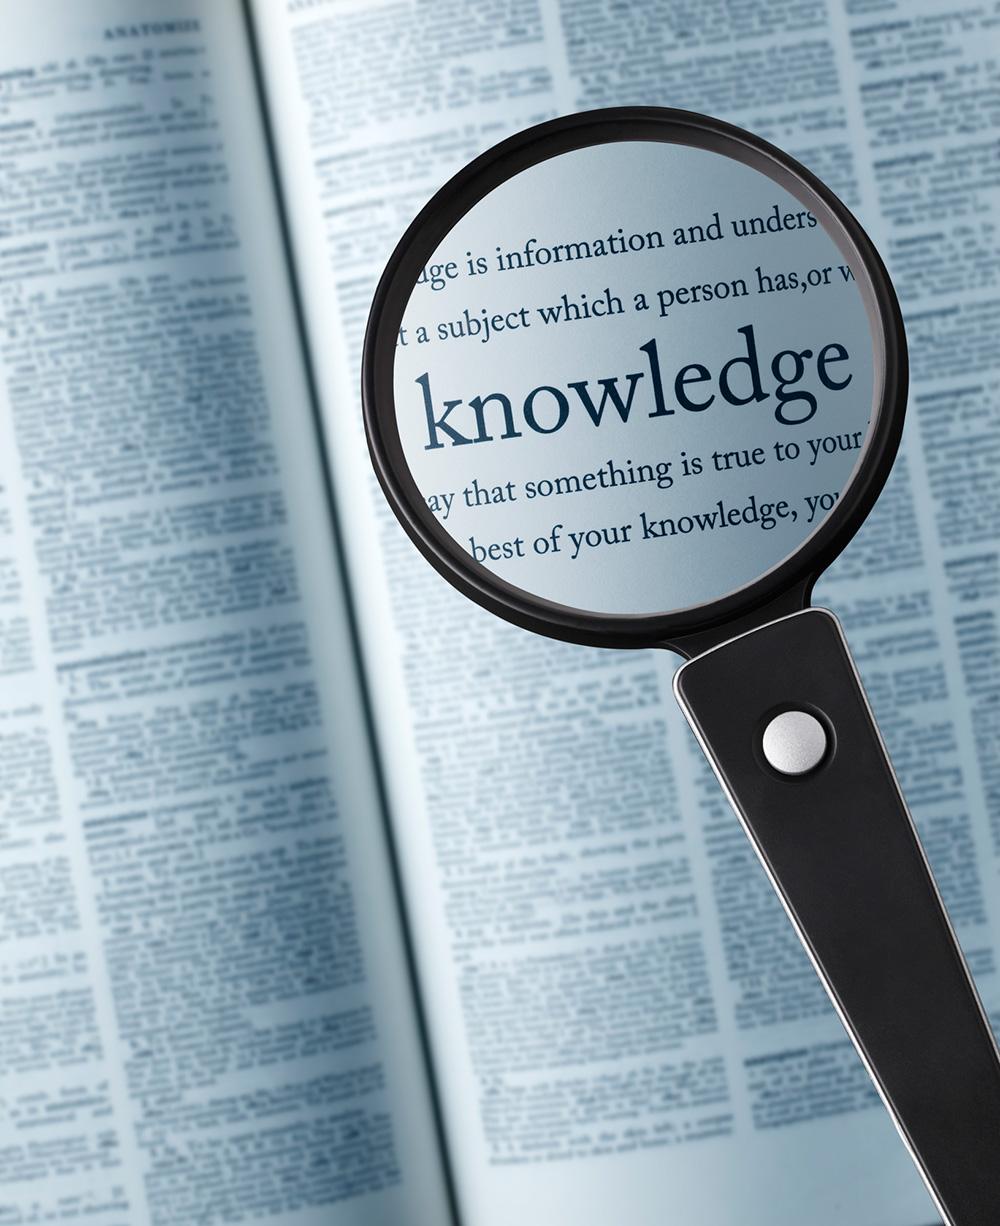 「知識」の画像検索結果